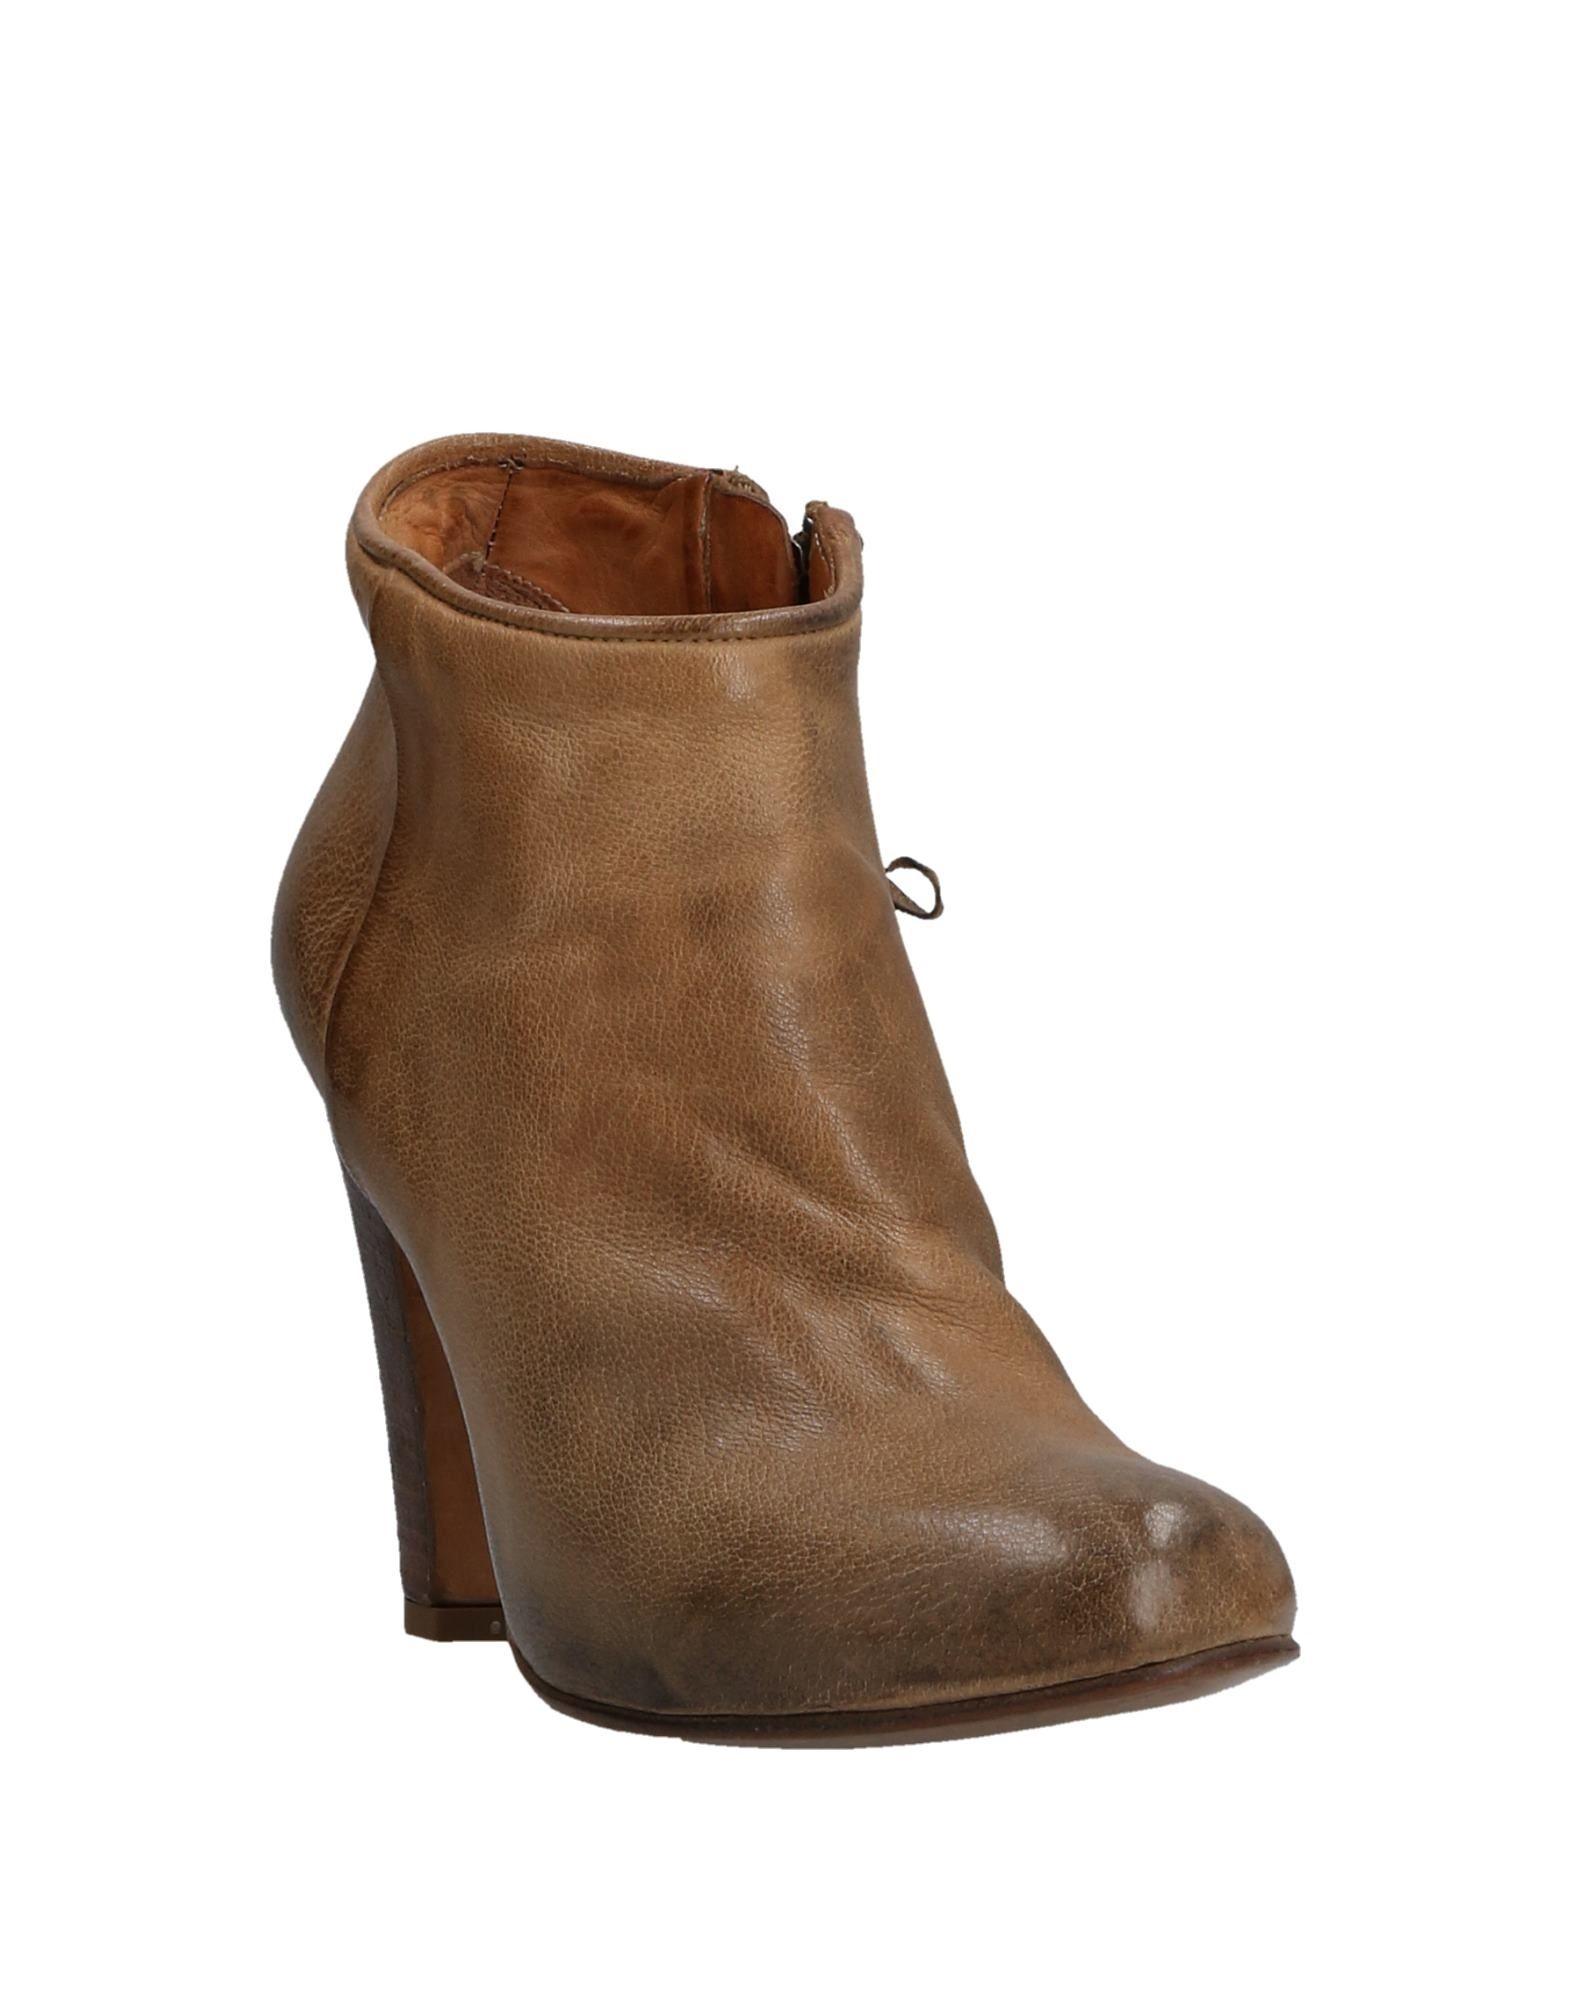 Panetulipani Stiefelette Damen Schuhe  11521345KXGut aussehende strapazierfähige Schuhe Damen 646a78